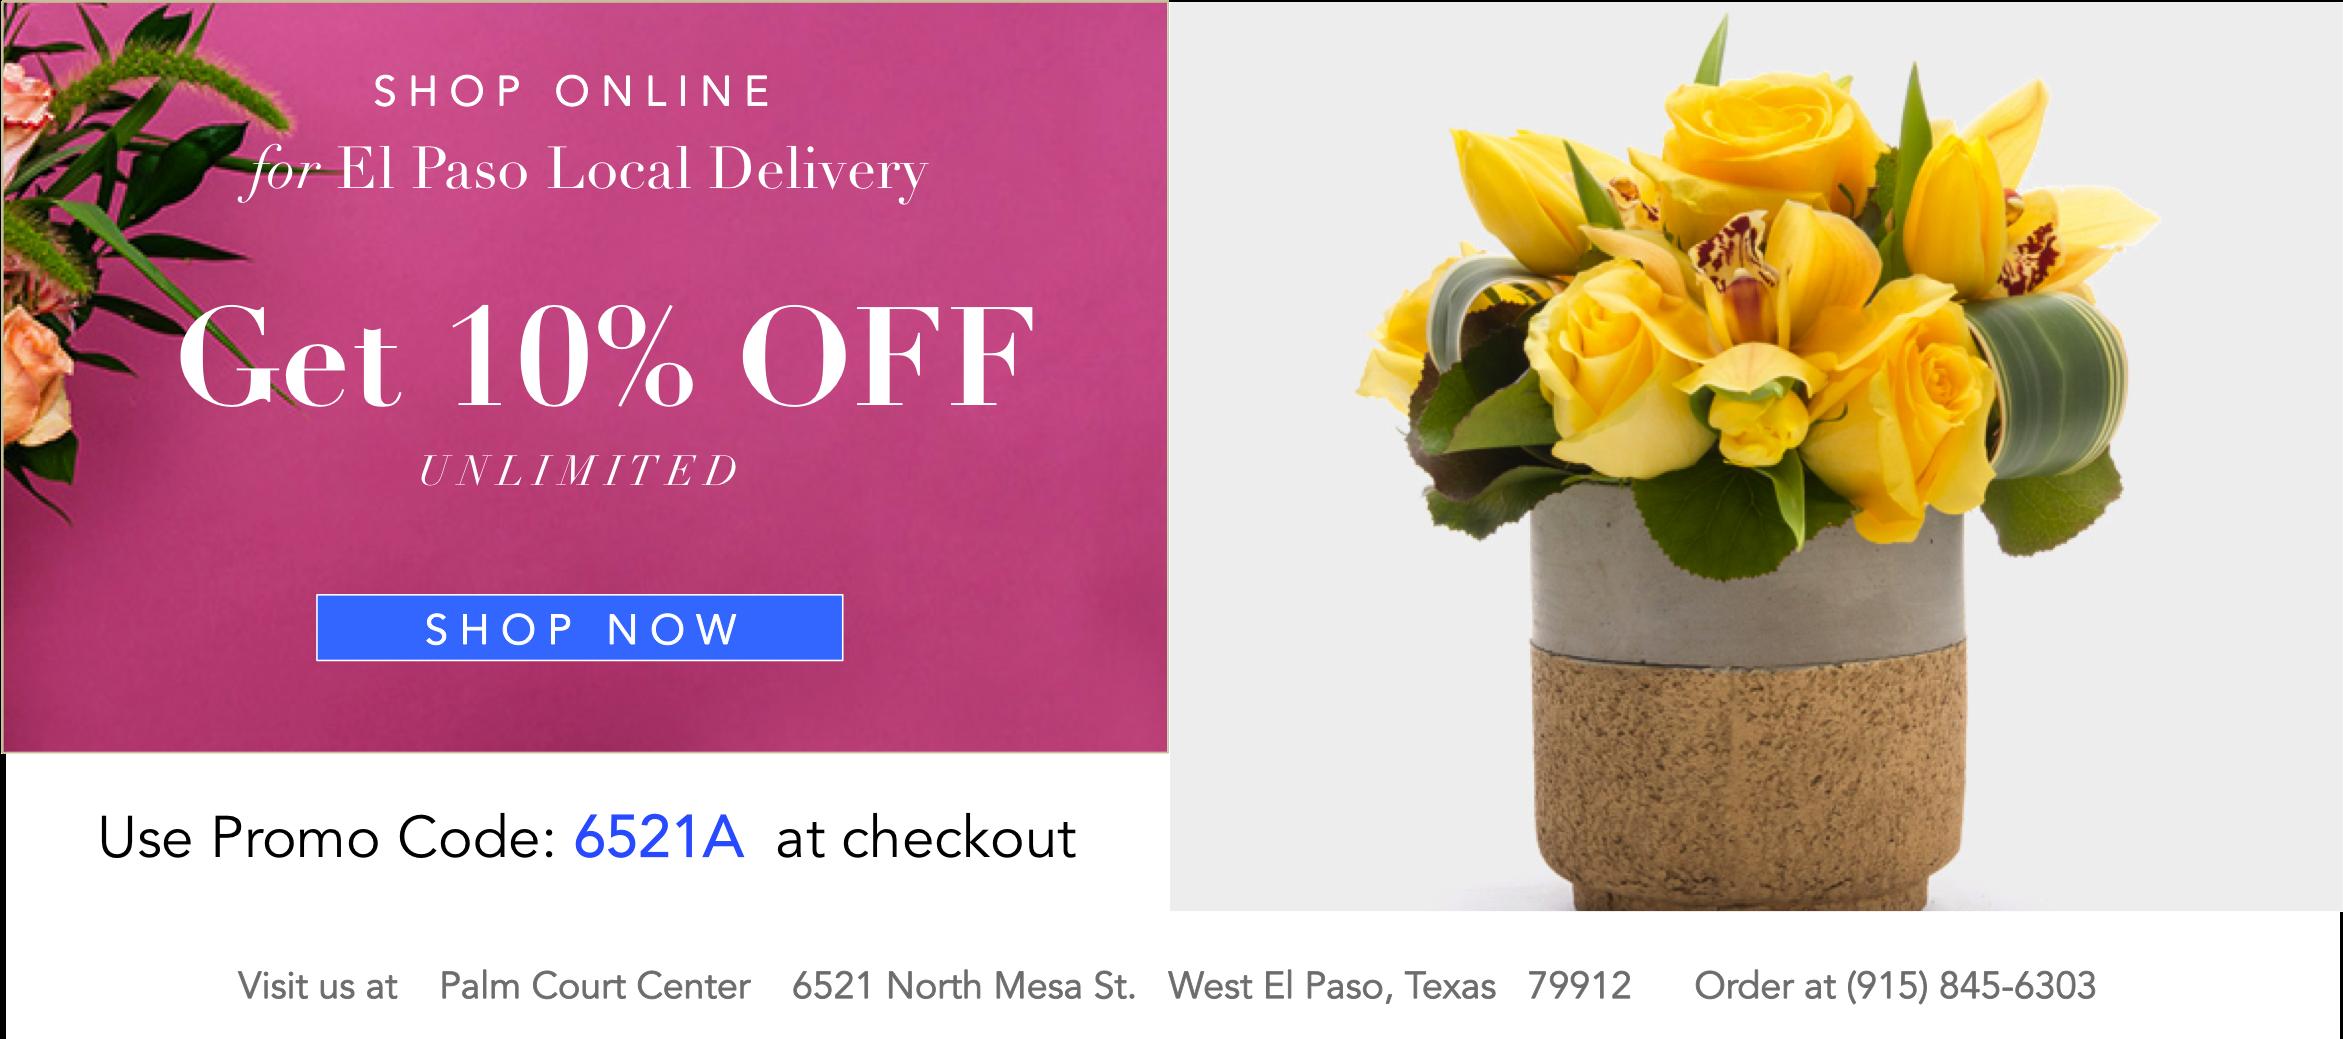 11aangies-floral-designs-el-paso-florist-79912-el-paso-texas-angies-flowers-el-paso-flowershop-el-paso-flowerdelivery-elegant-flowers-79912-westside-weddings-events-rentals-bodas-flores.png